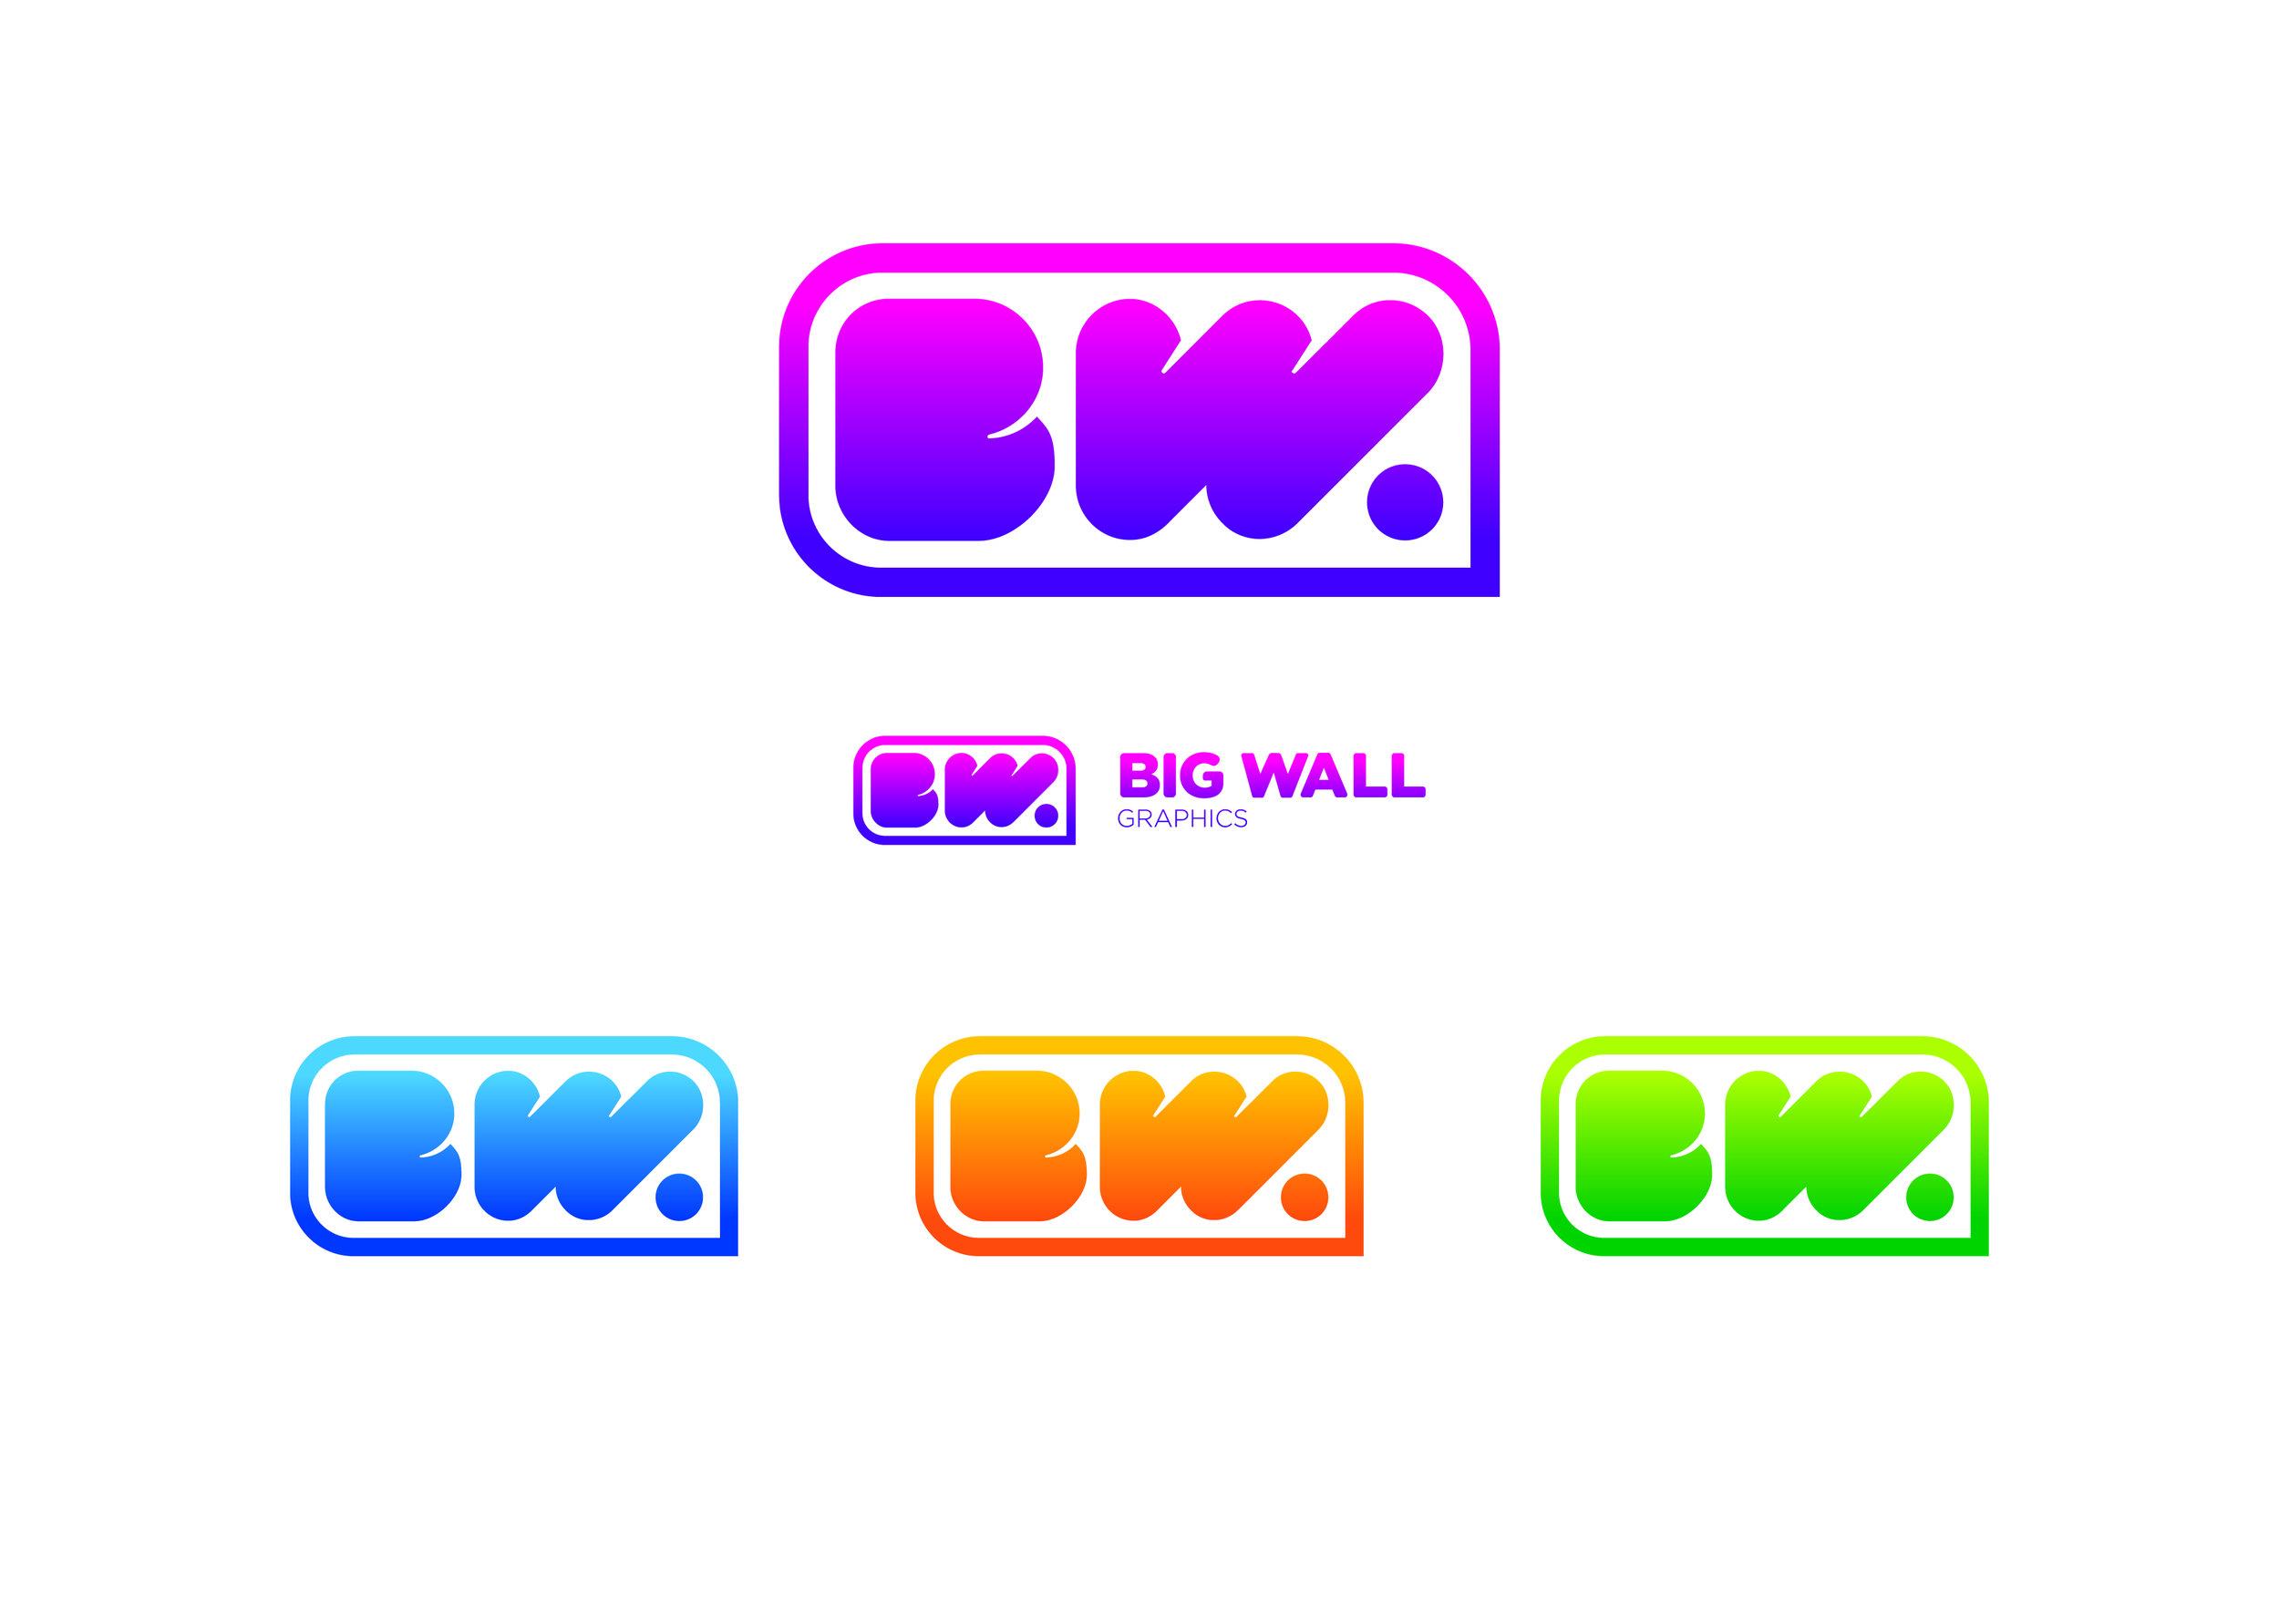 Big Wall Graphics Logo_30_2.jpg